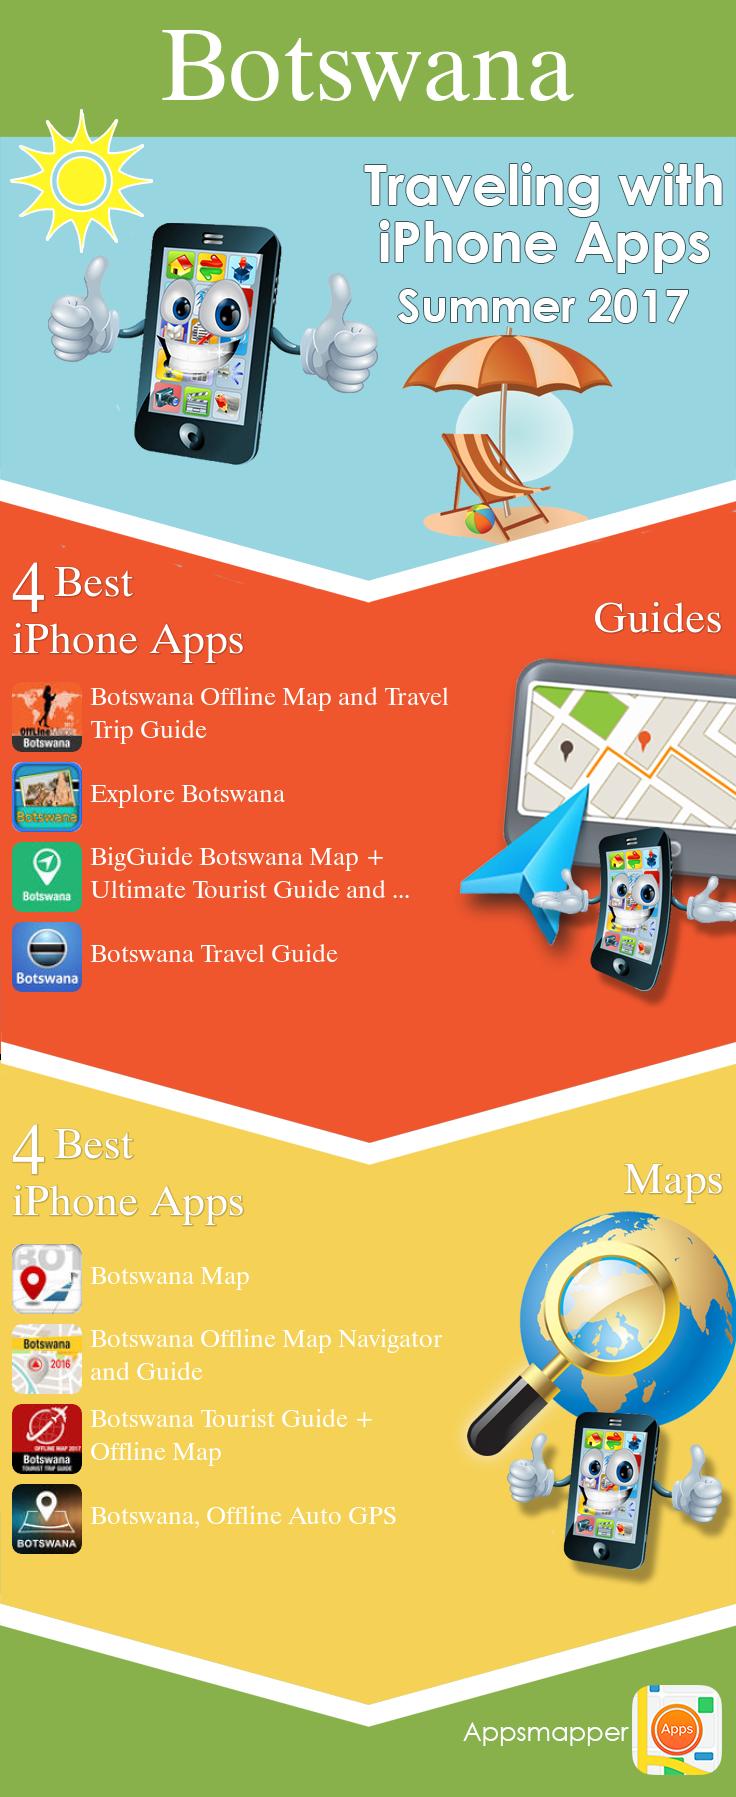 Botswana iPhone apps: Travel Guides, Maps, Transportation